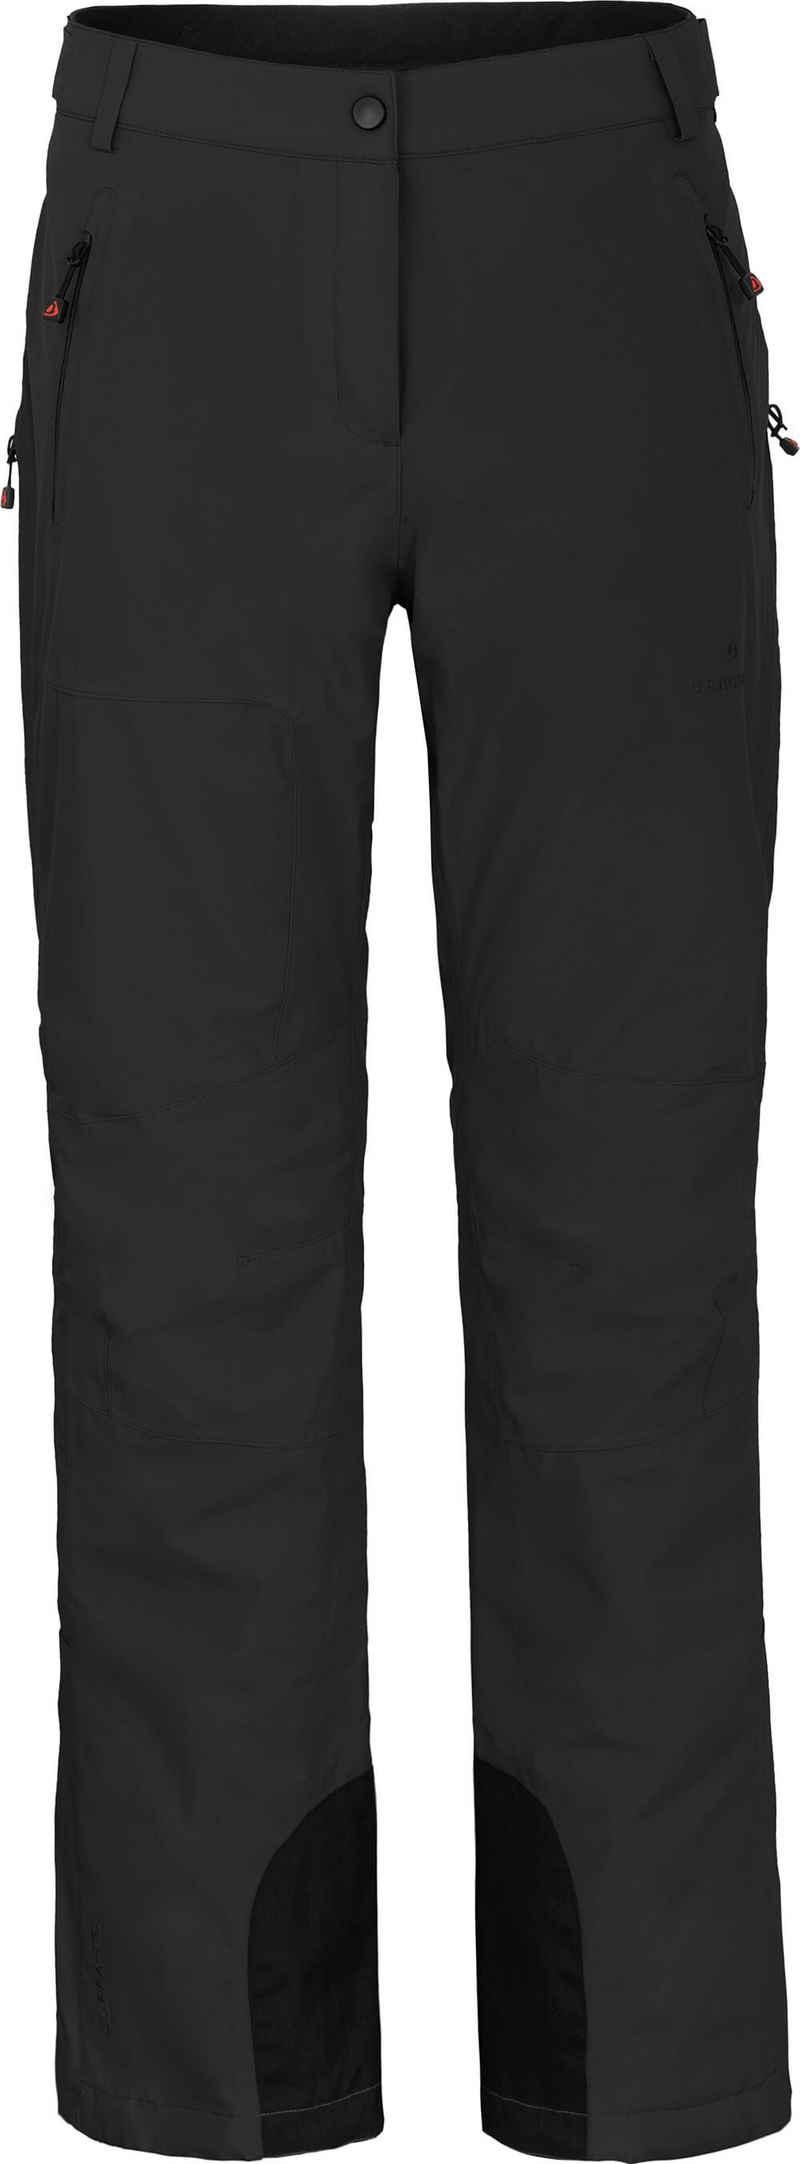 Bergson Skihose »ICE light« Damen Skihose, unwattiert, 20000 mm Wassersäule, Kurzgrößen, schwarz